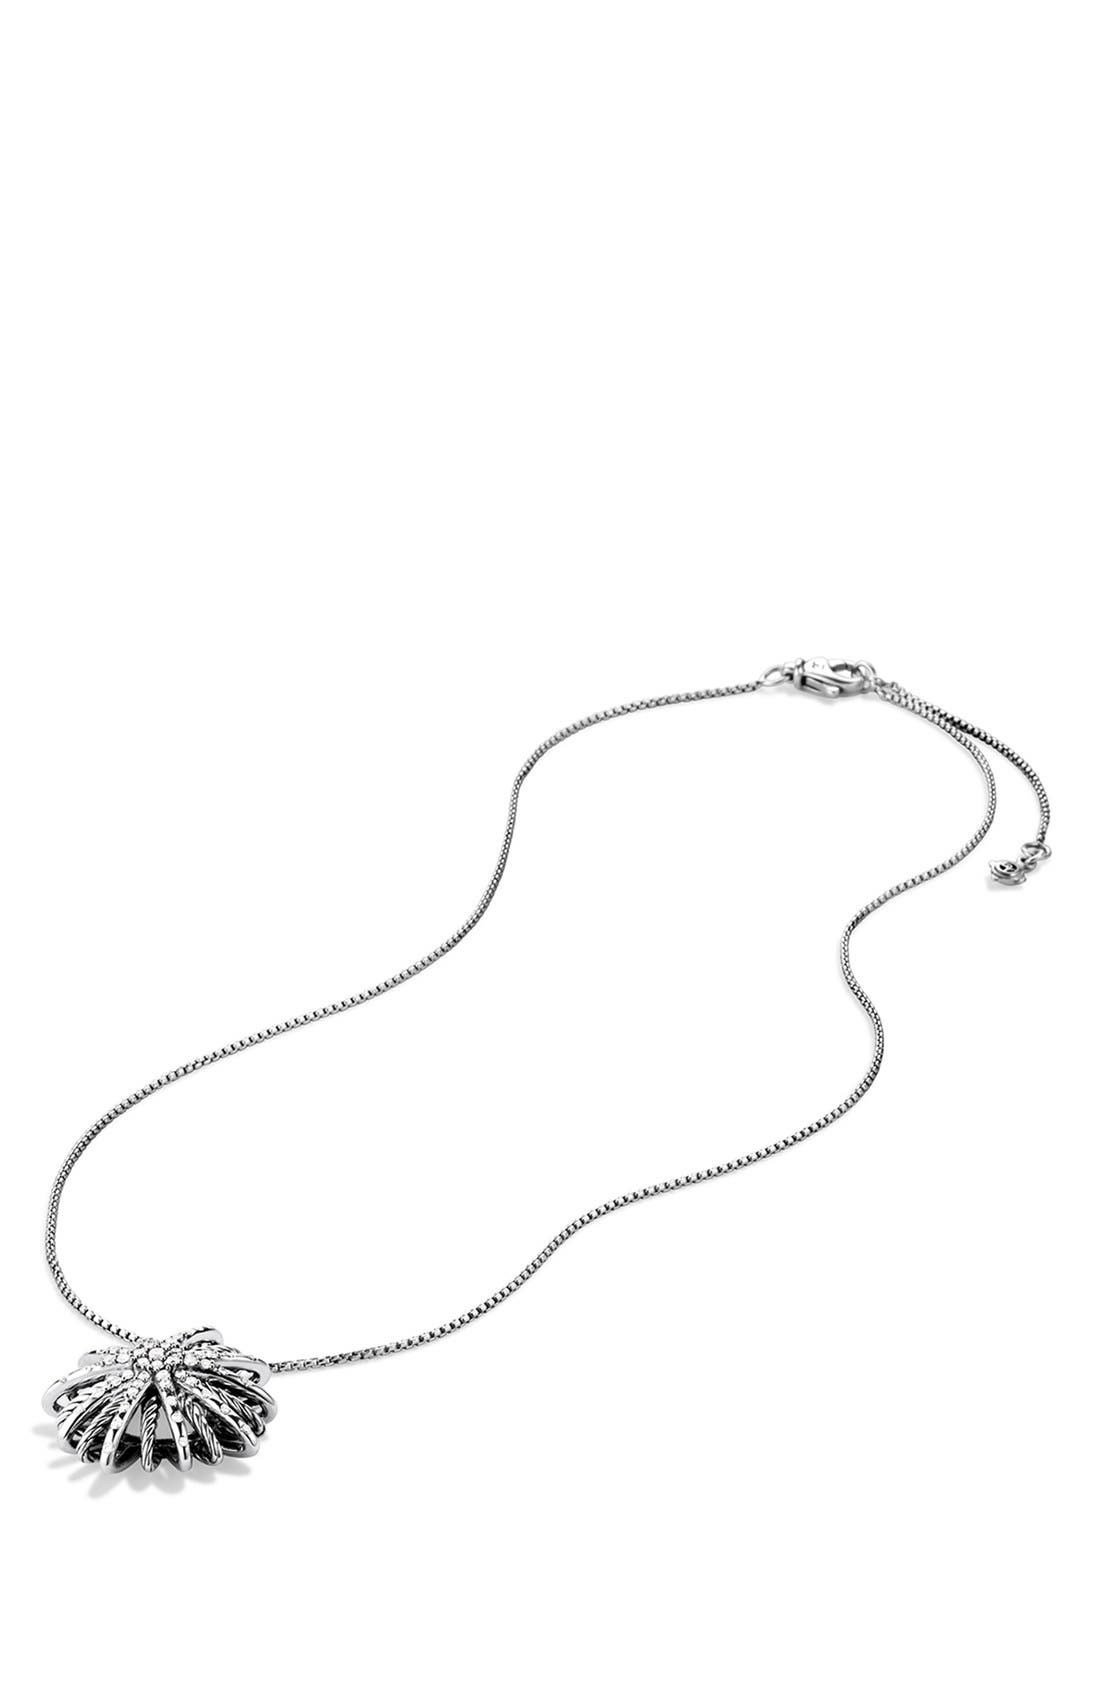 'Starburst' Medium Pendant with Diamonds on Chain,                             Alternate thumbnail 7, color,                             DIAMOND